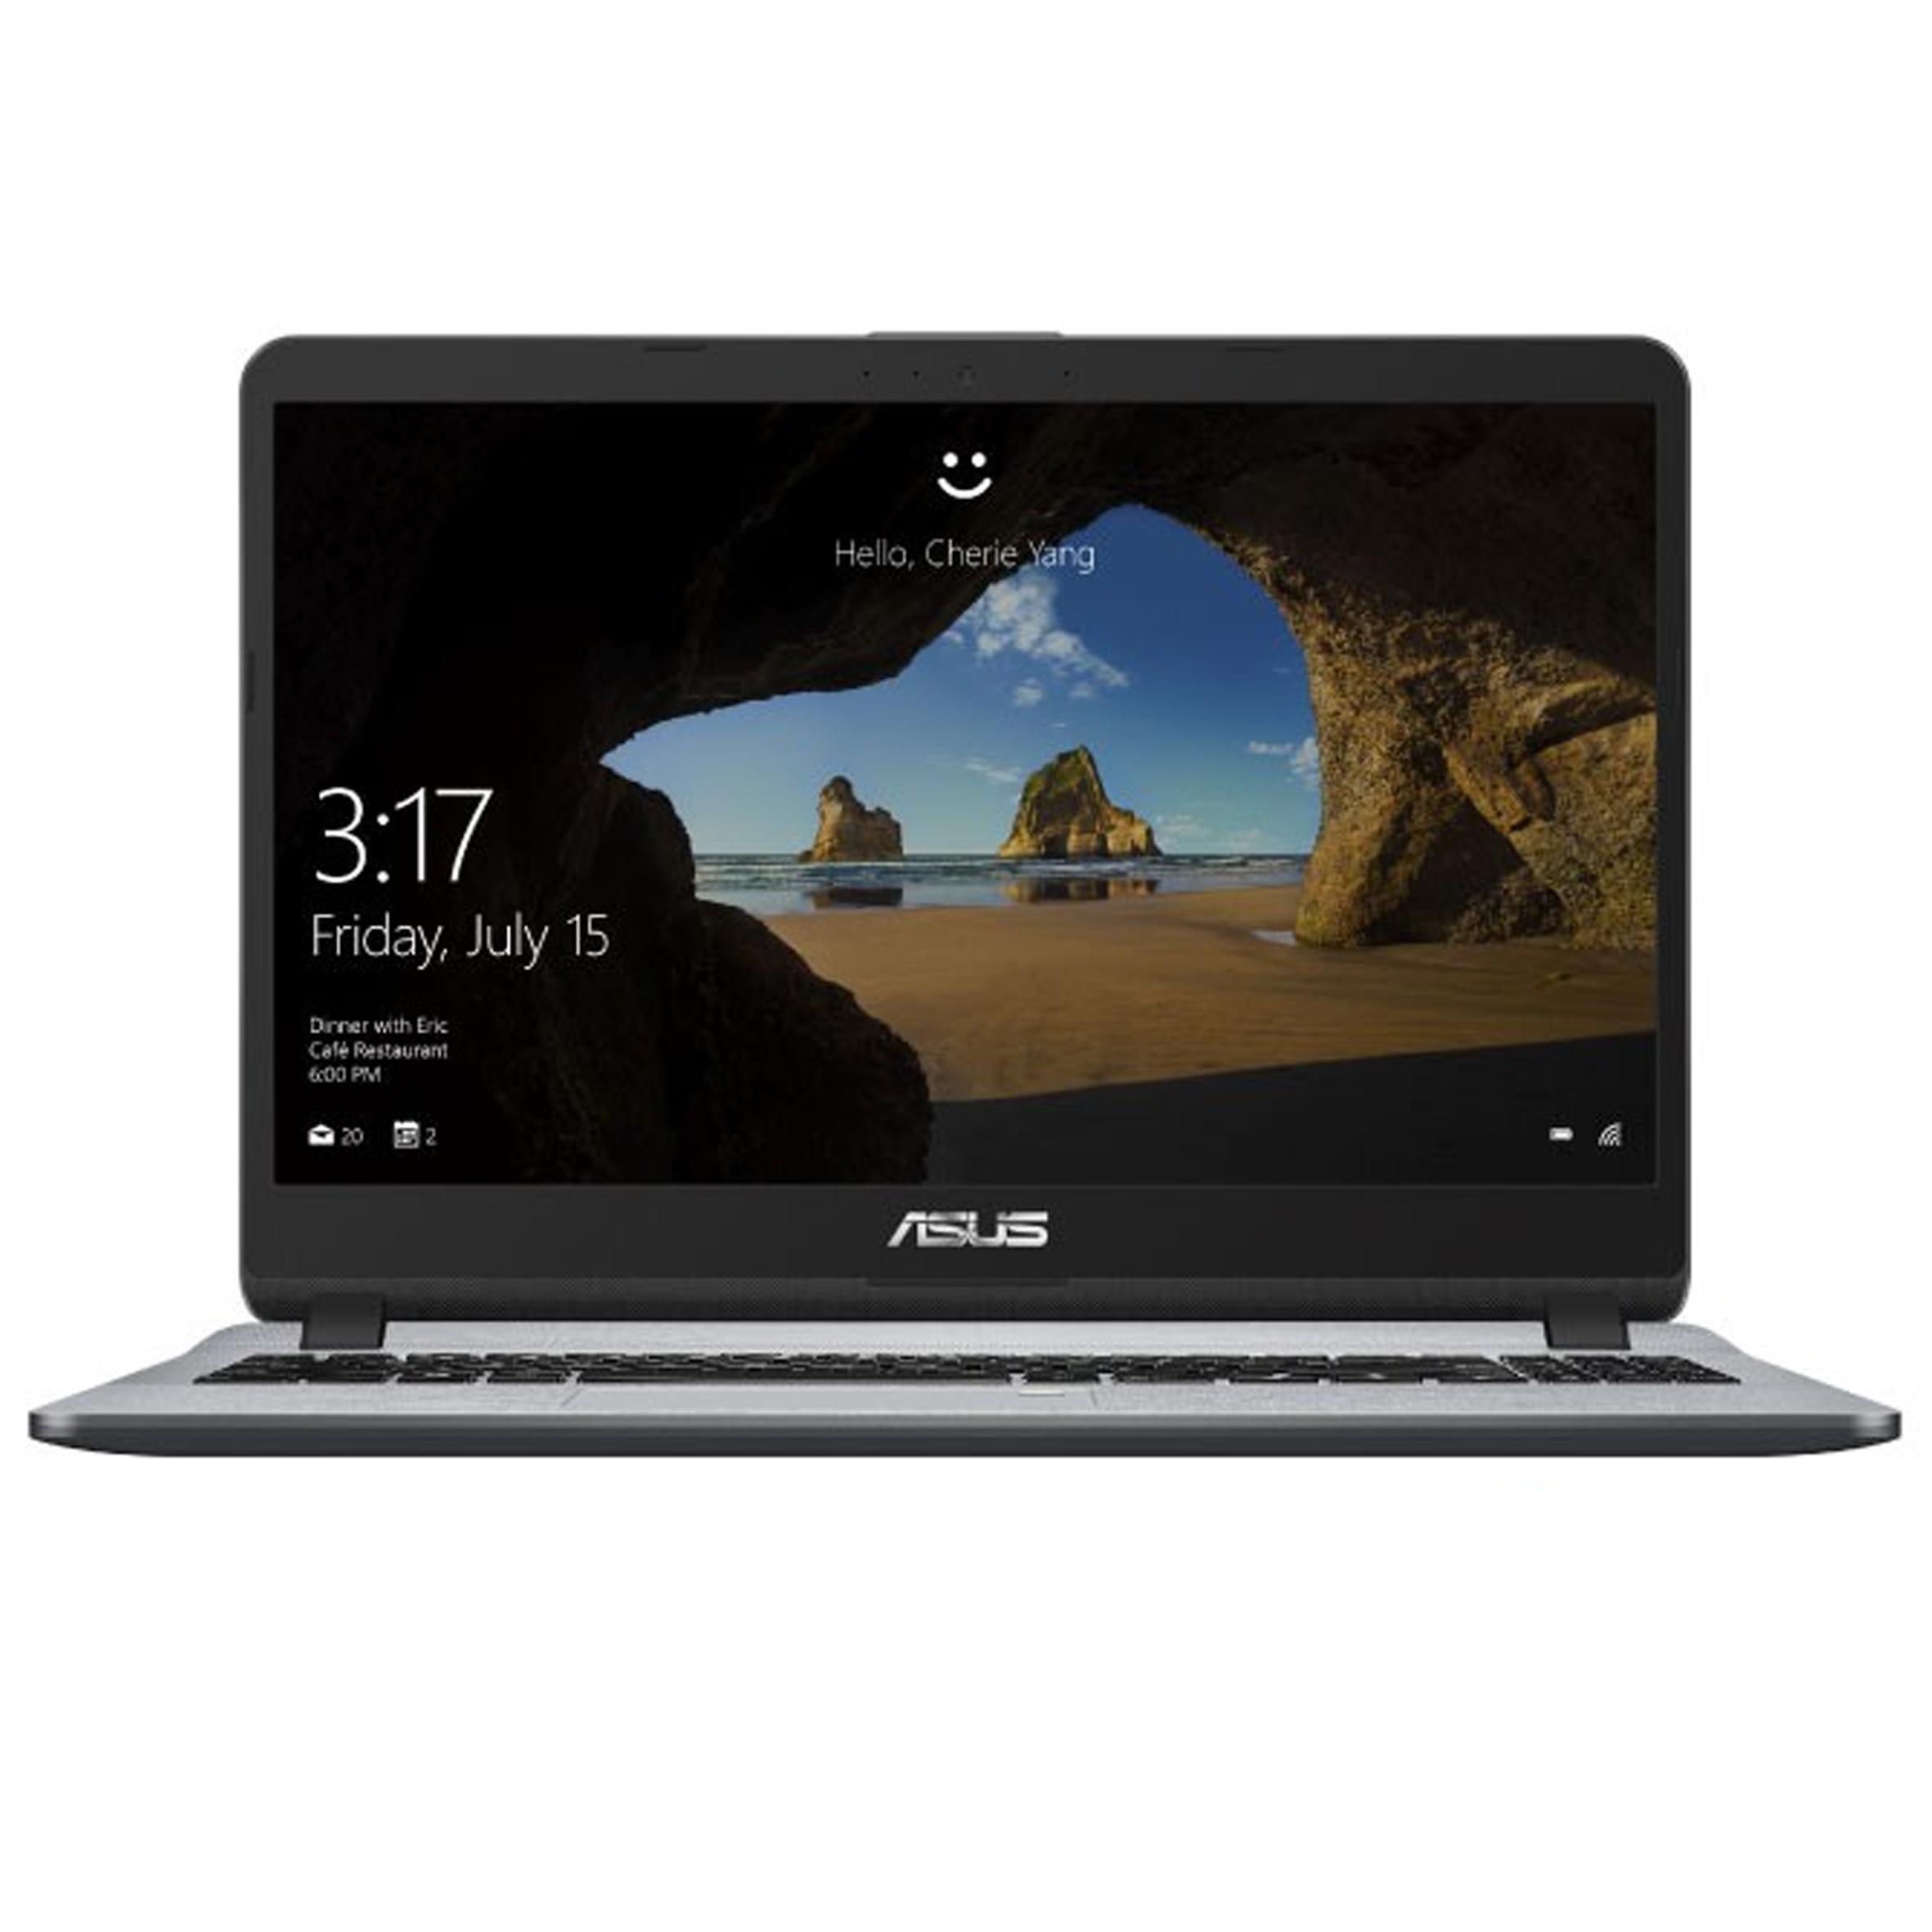 PORTATIL ASUS X507UA/8550U/COREI7/1TB/4GB + 16GB OPTANE/15″/WIN 10 HOME